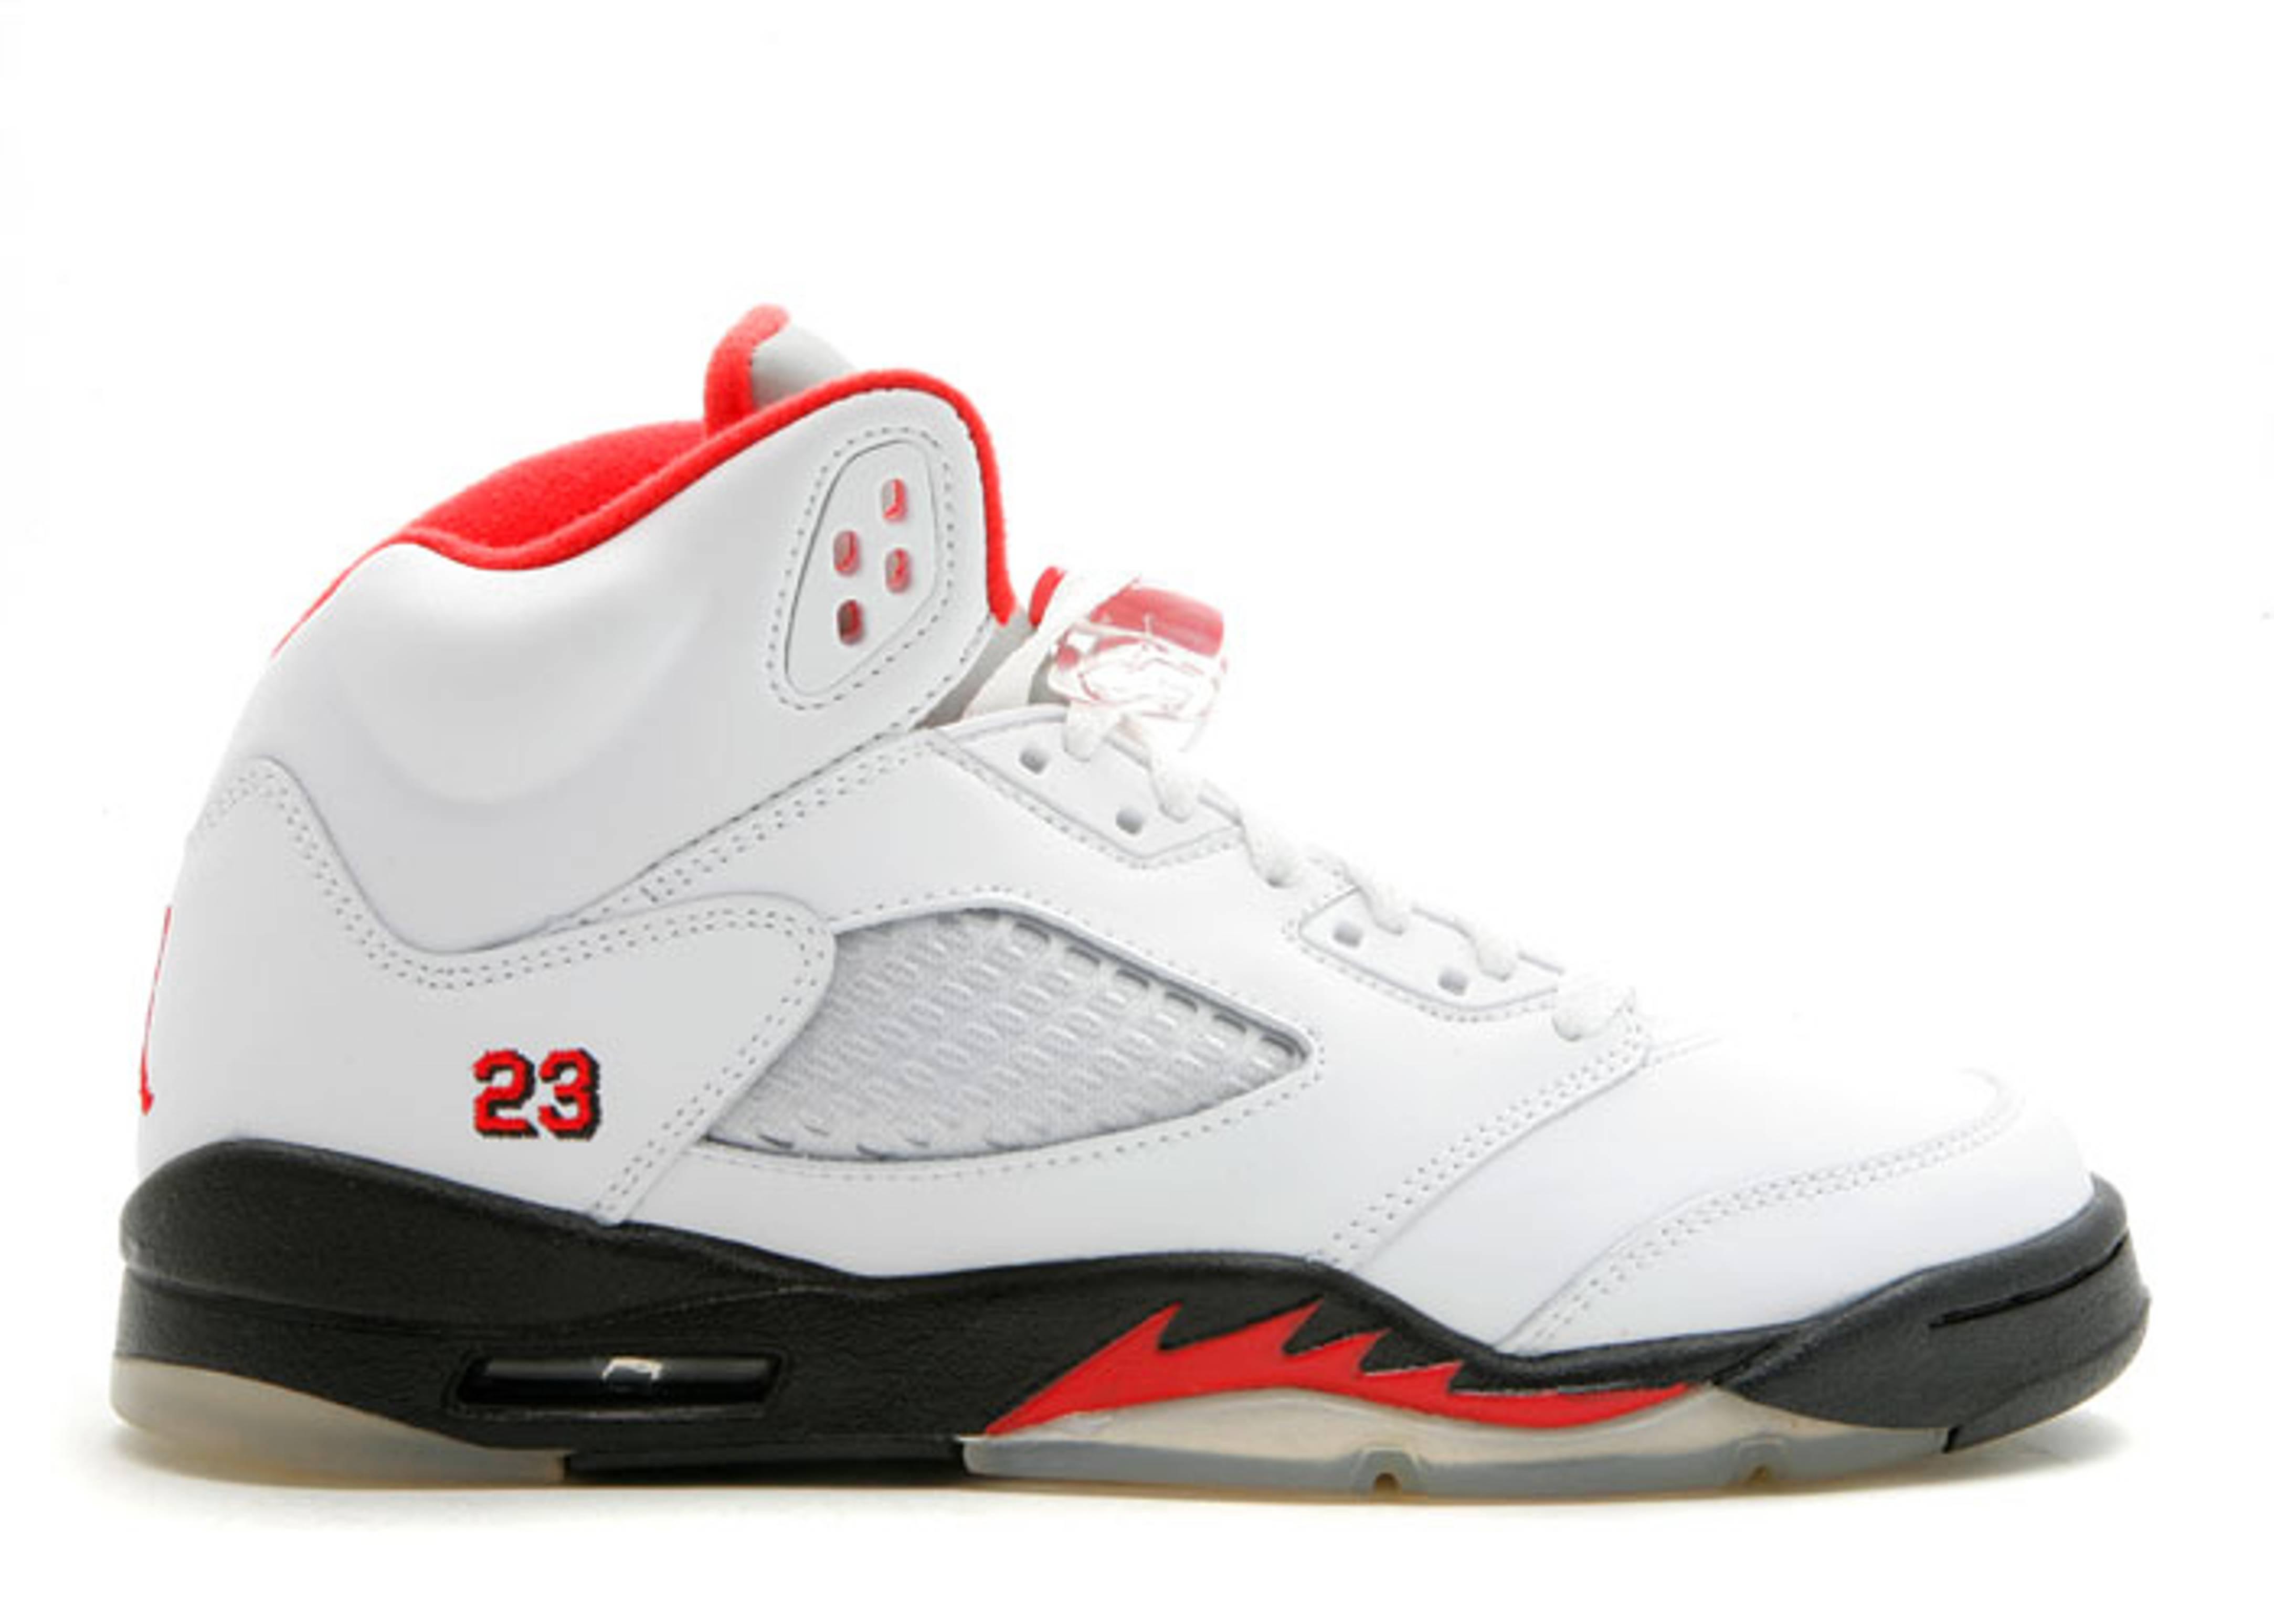 official photos 3e89a 16a6c Jordan Collezione 18 5 (gs)